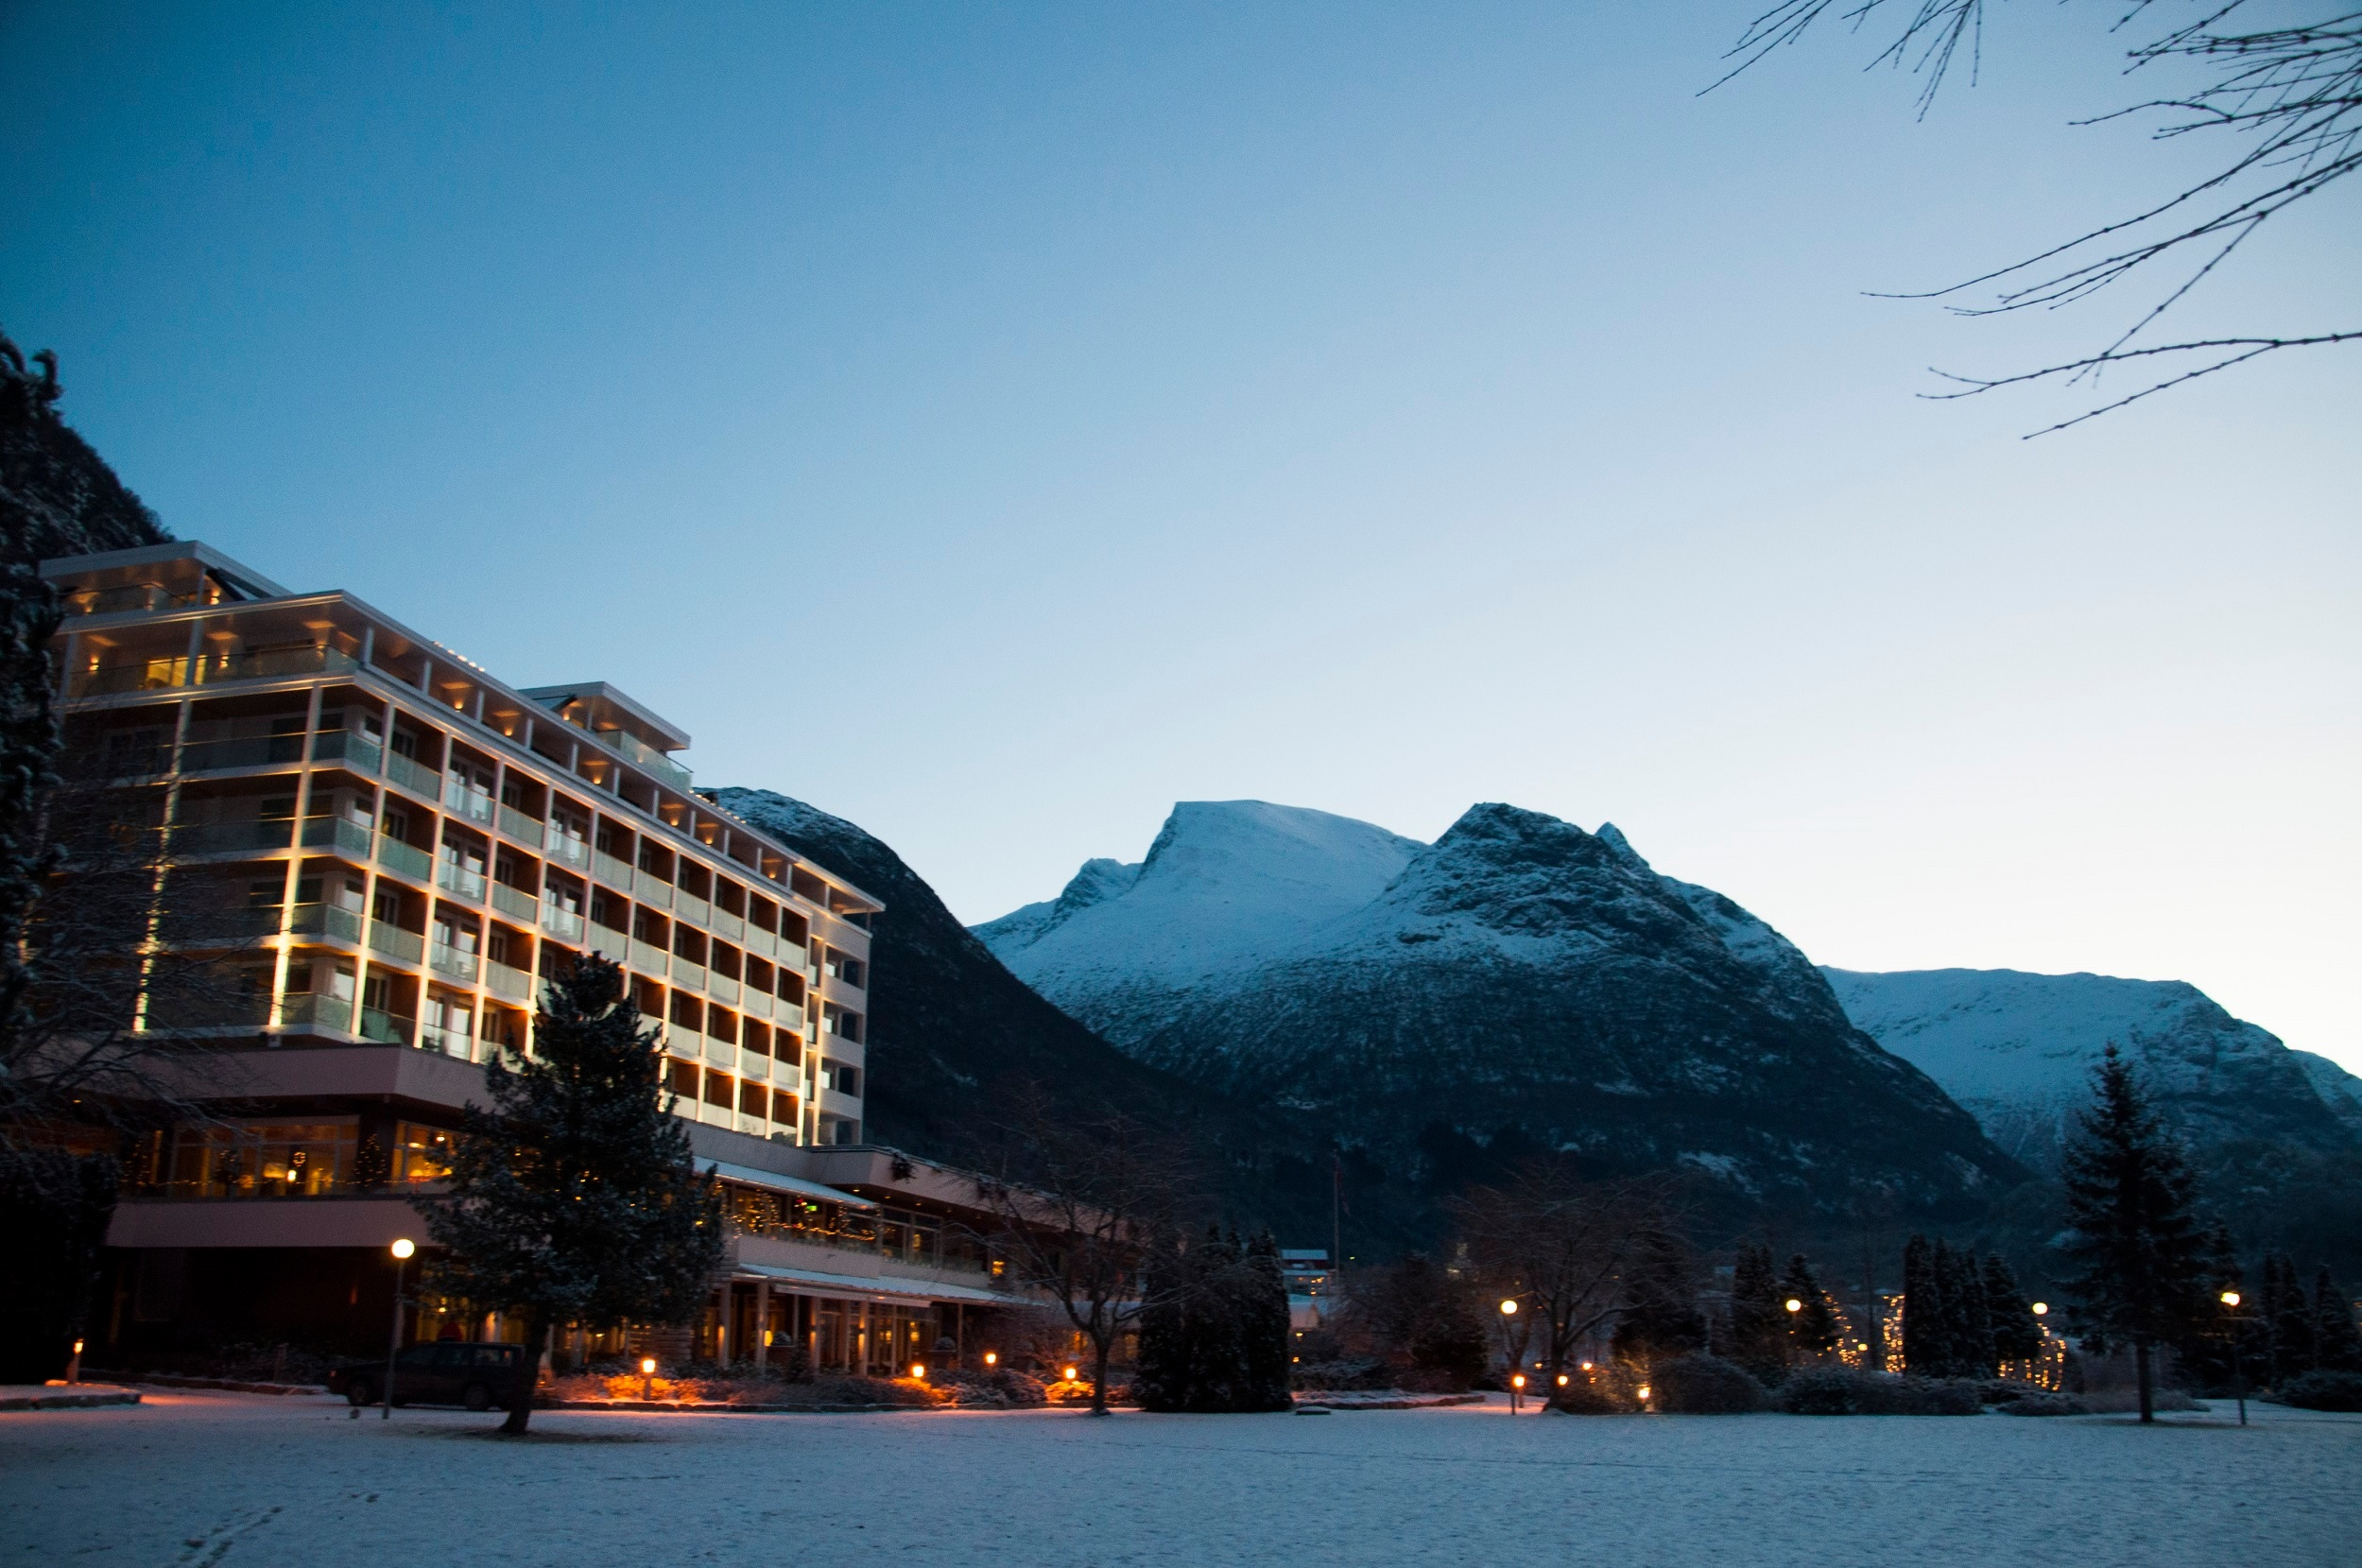 Hotel+Alexandra+in+Loen.+Janne+Alsaker.jpg